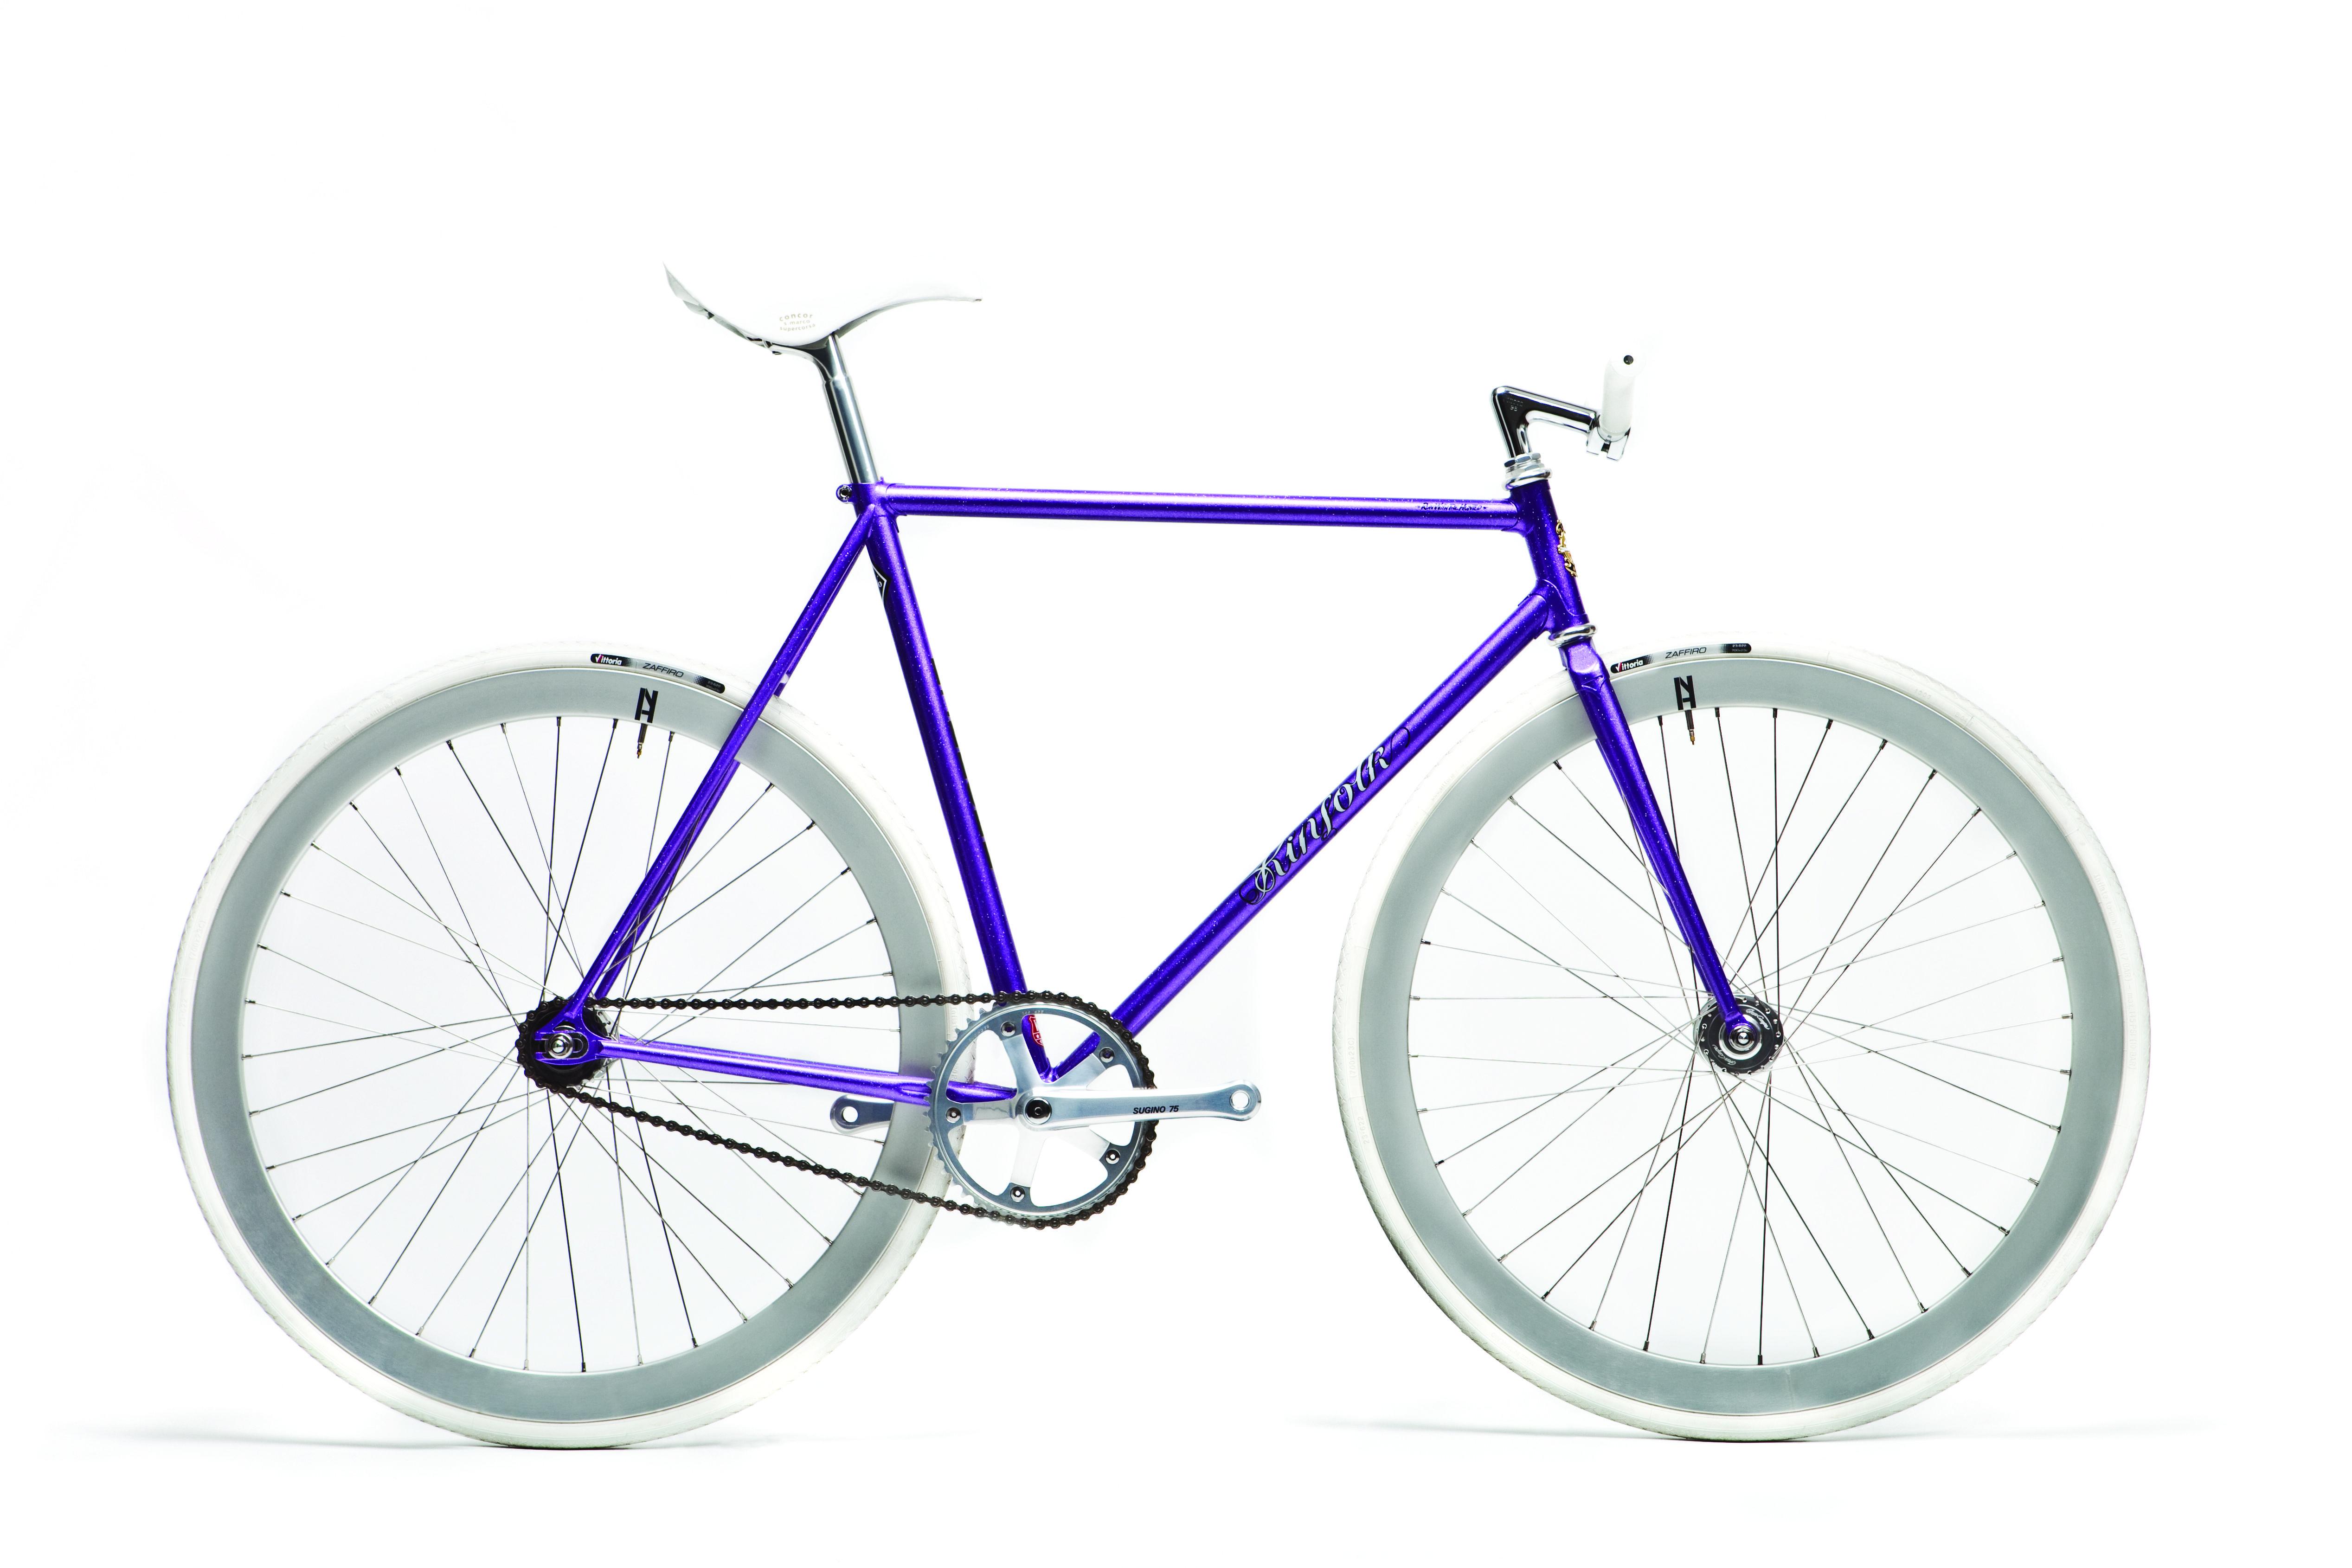 Kinfolk With Images Bicycle Fixed Bike Bike